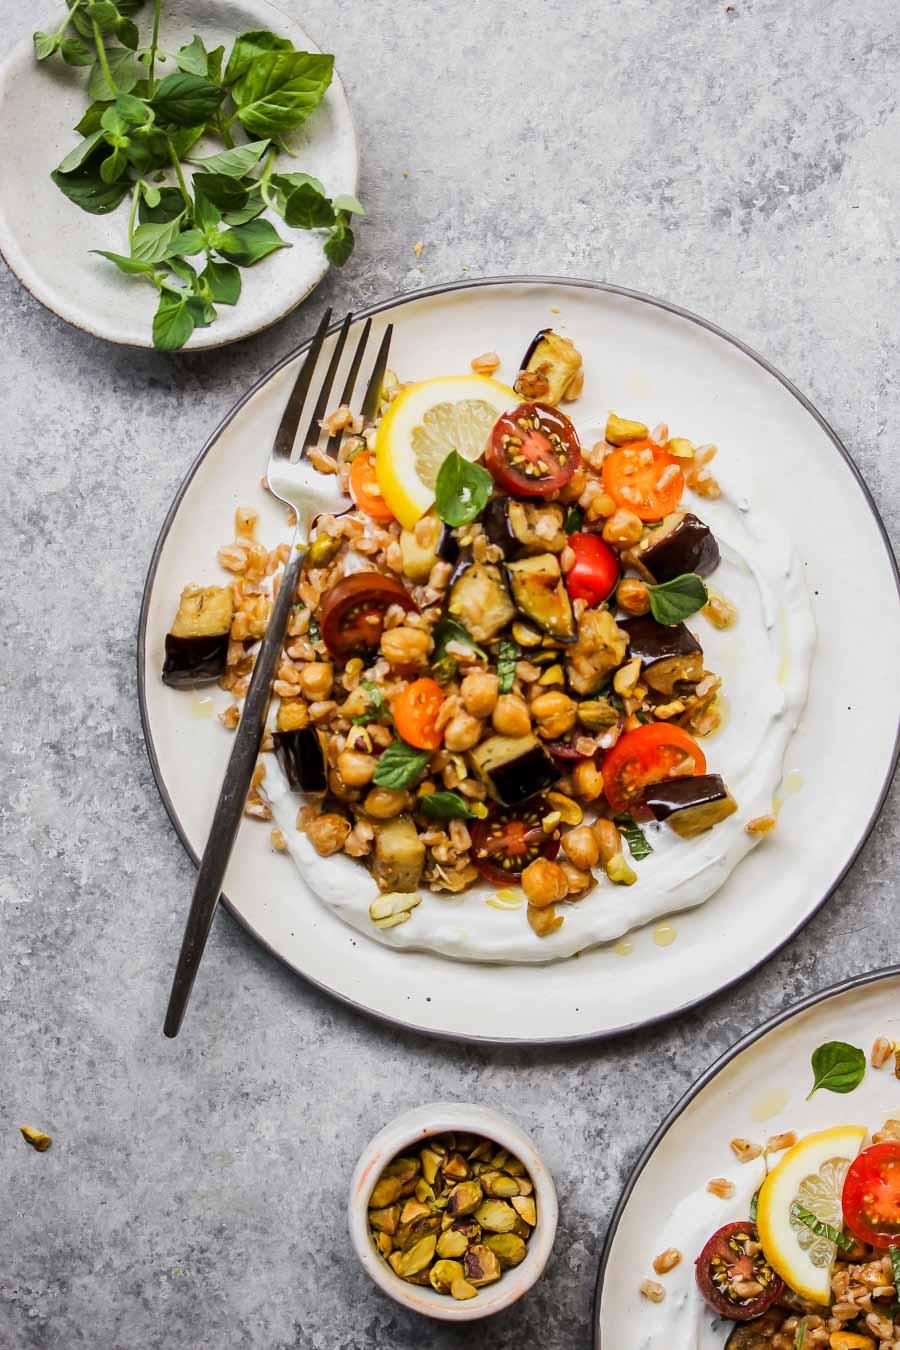 Eggplant and Chickpea Salad with Farro and Minty Yogurt